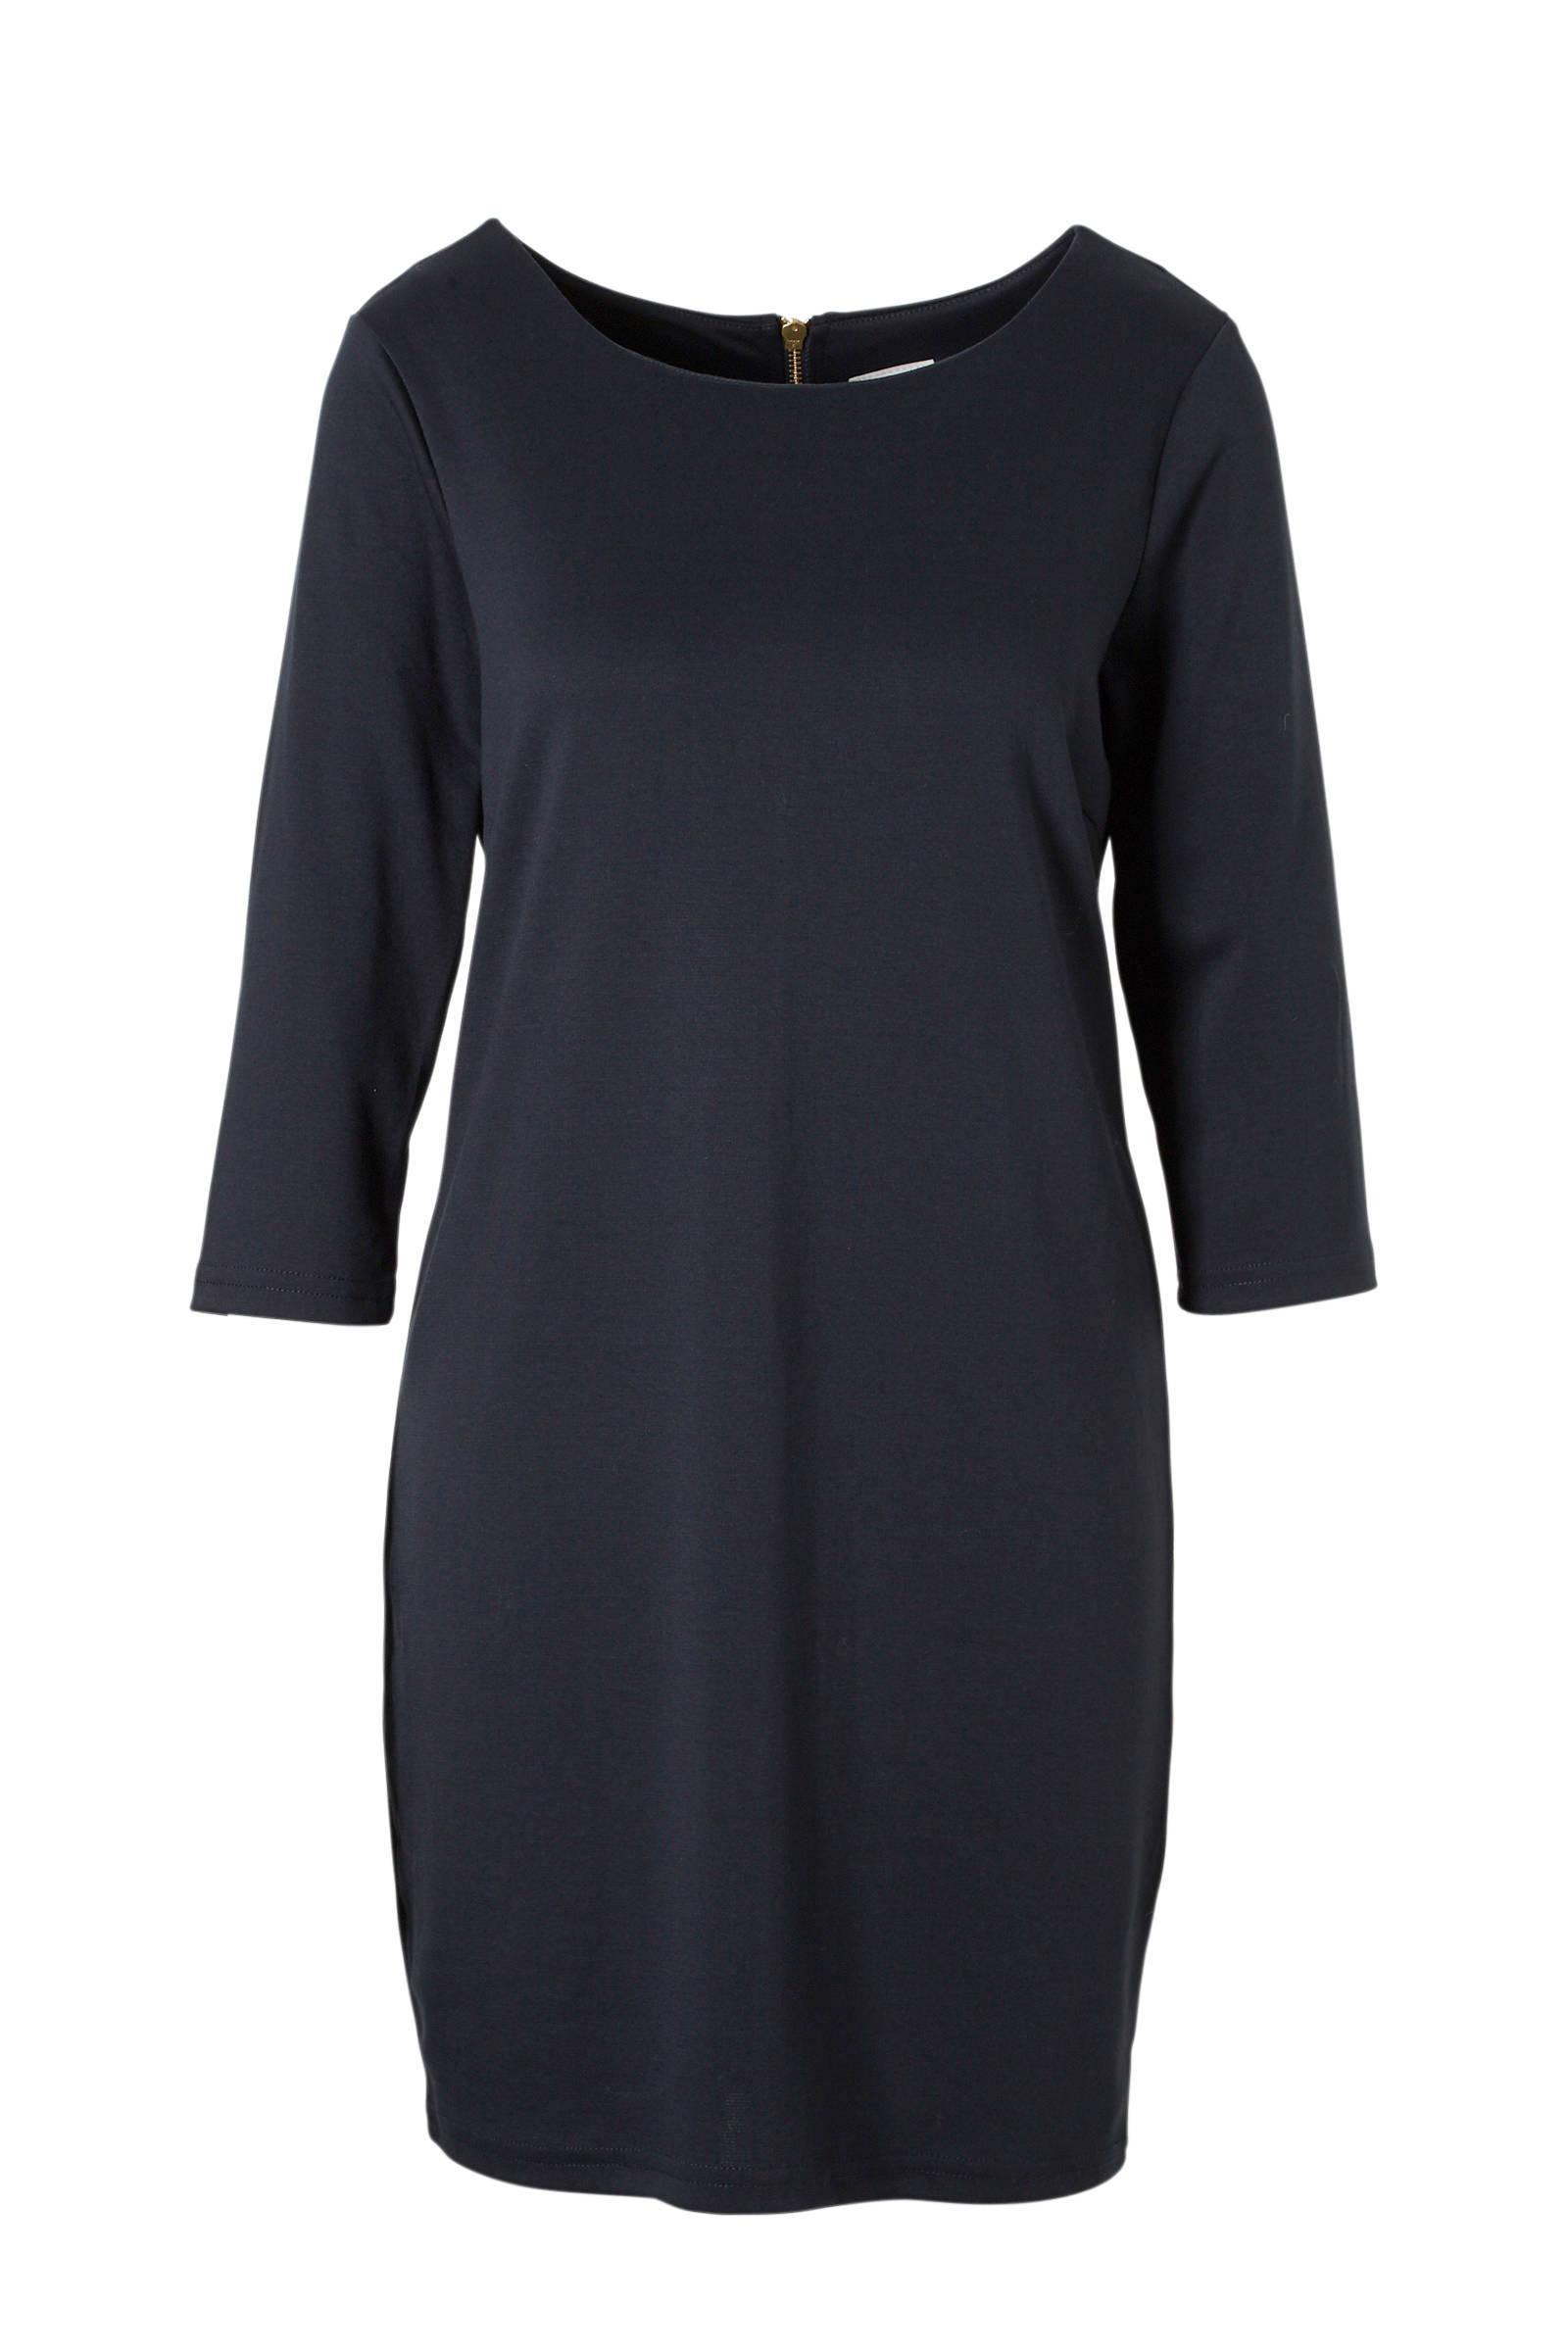 vila jurk donkerblauw